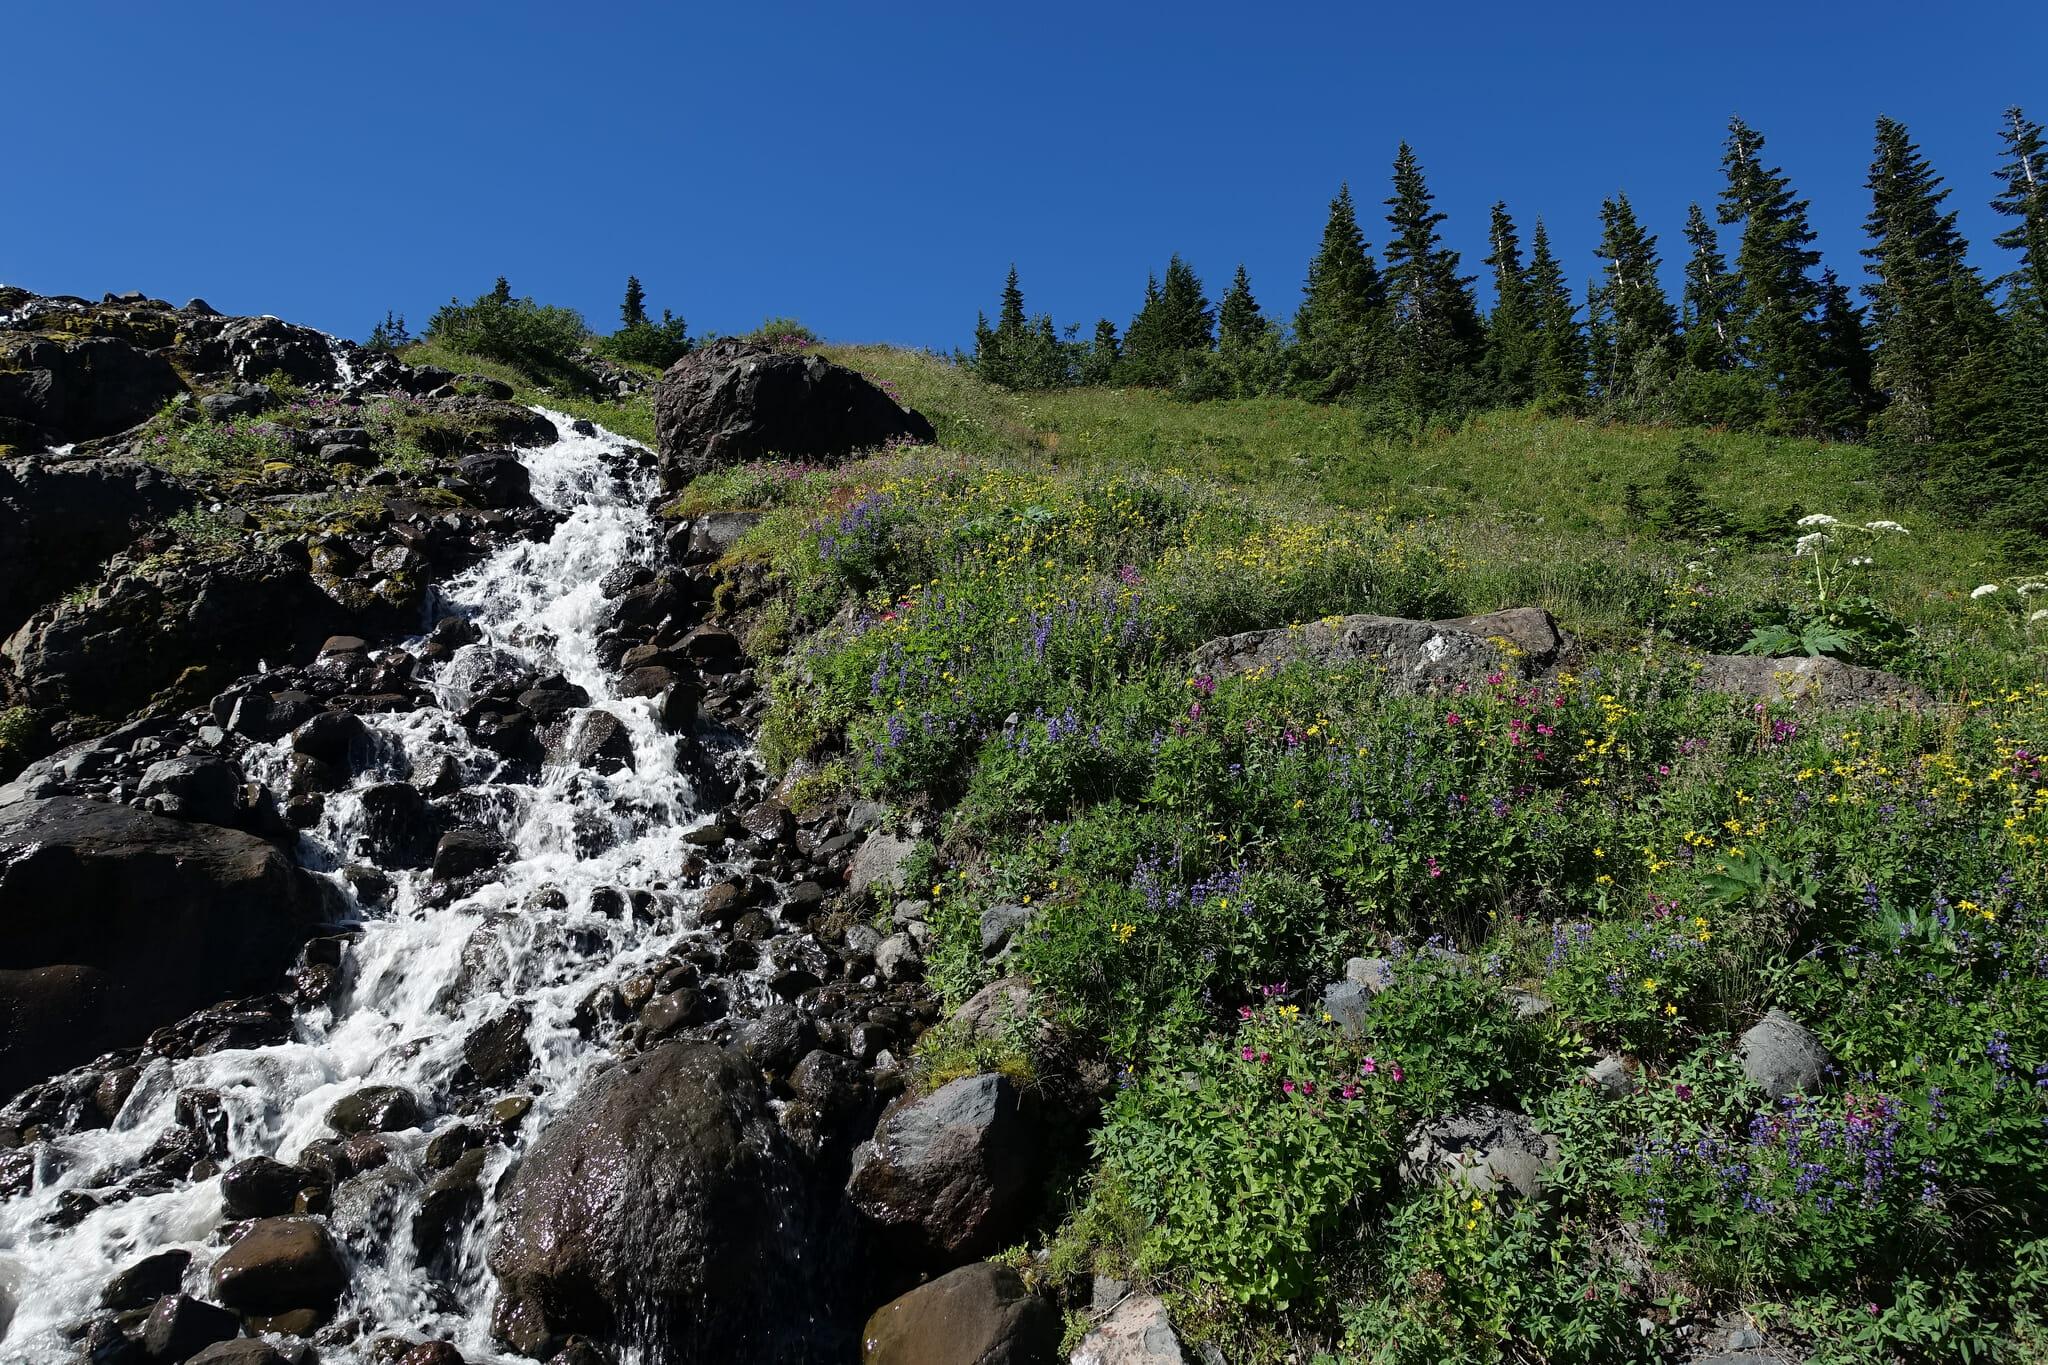 Heliotrope Creek and Wildflowers